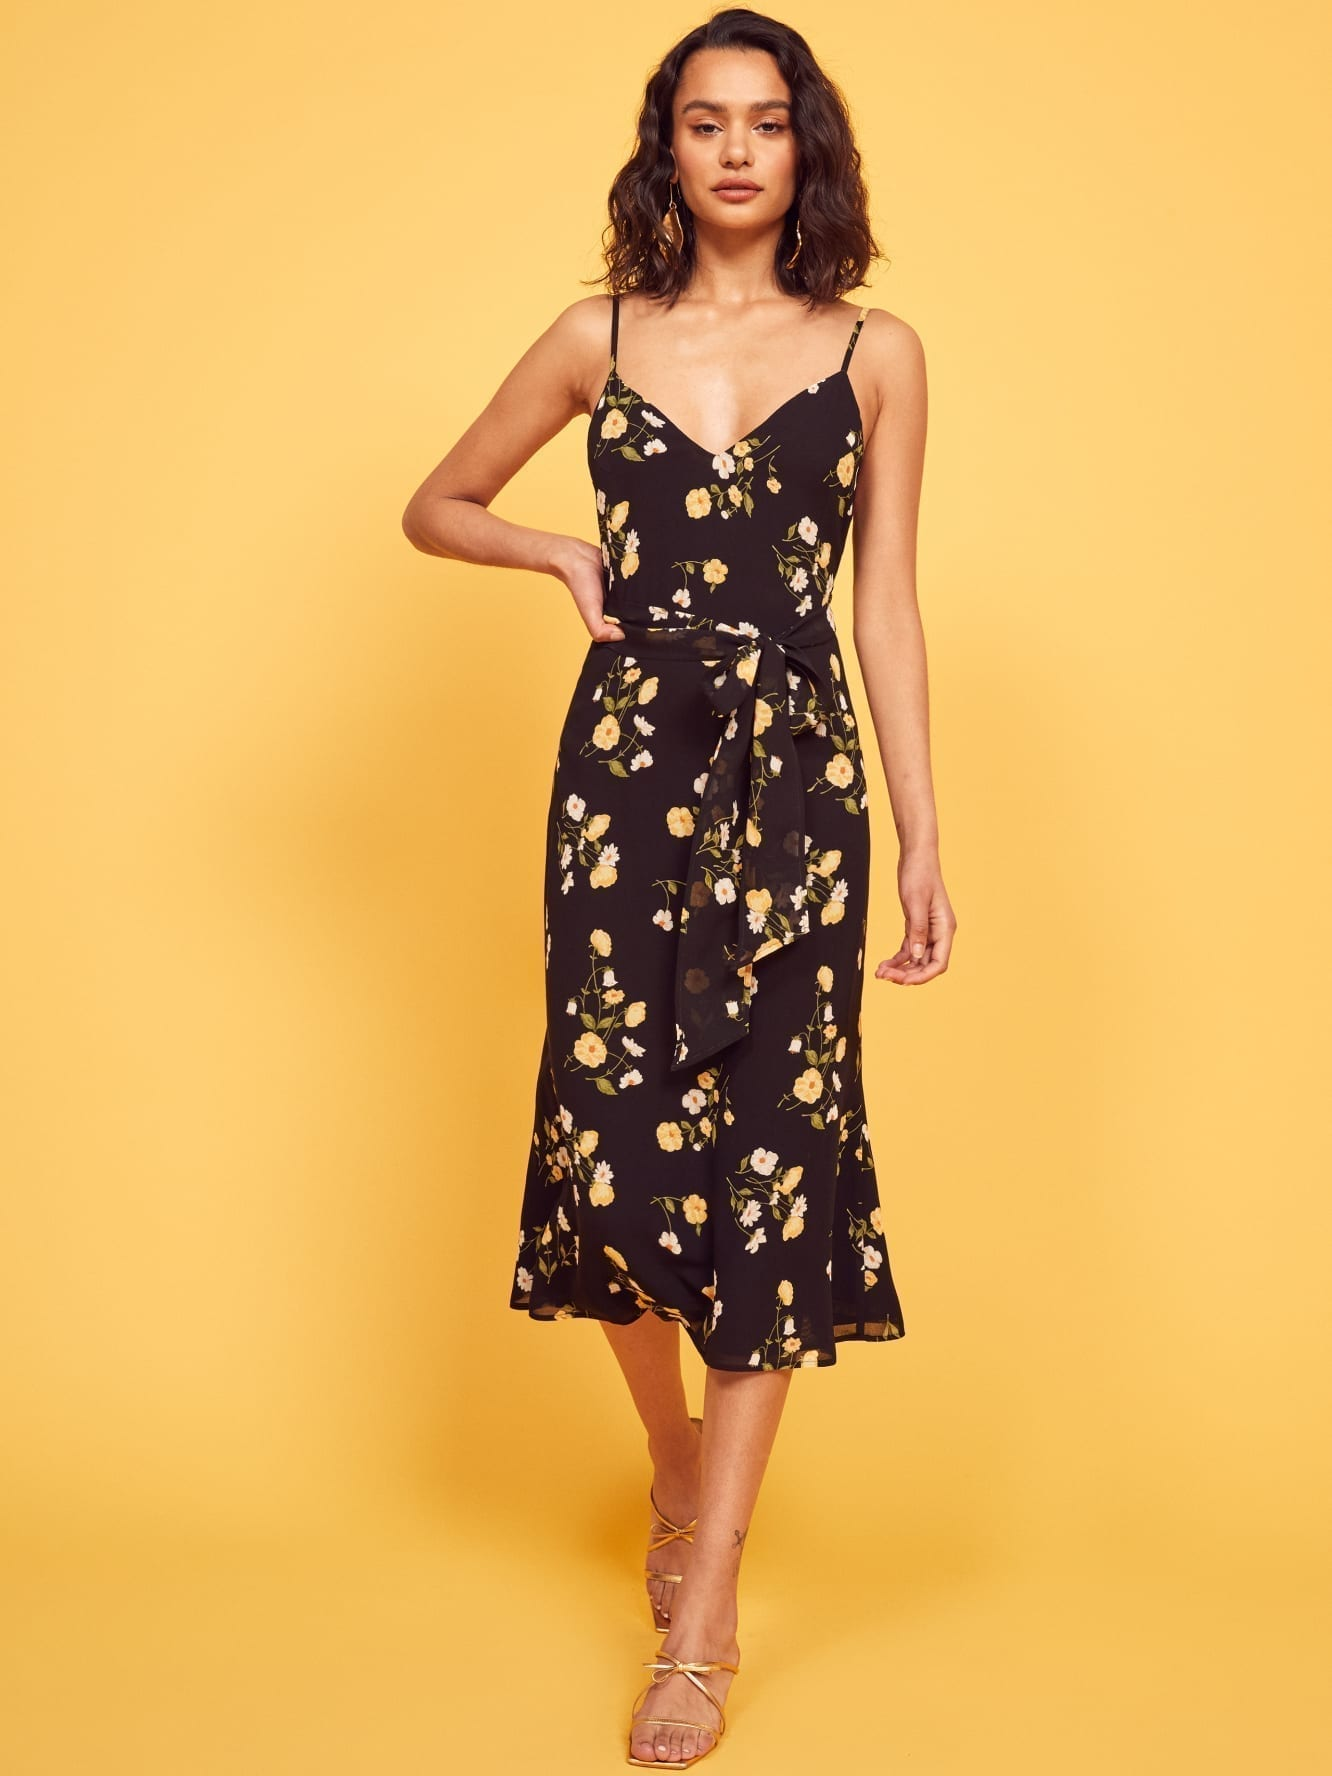 REFORMATION Dietrich Black / Floral Printed Dress